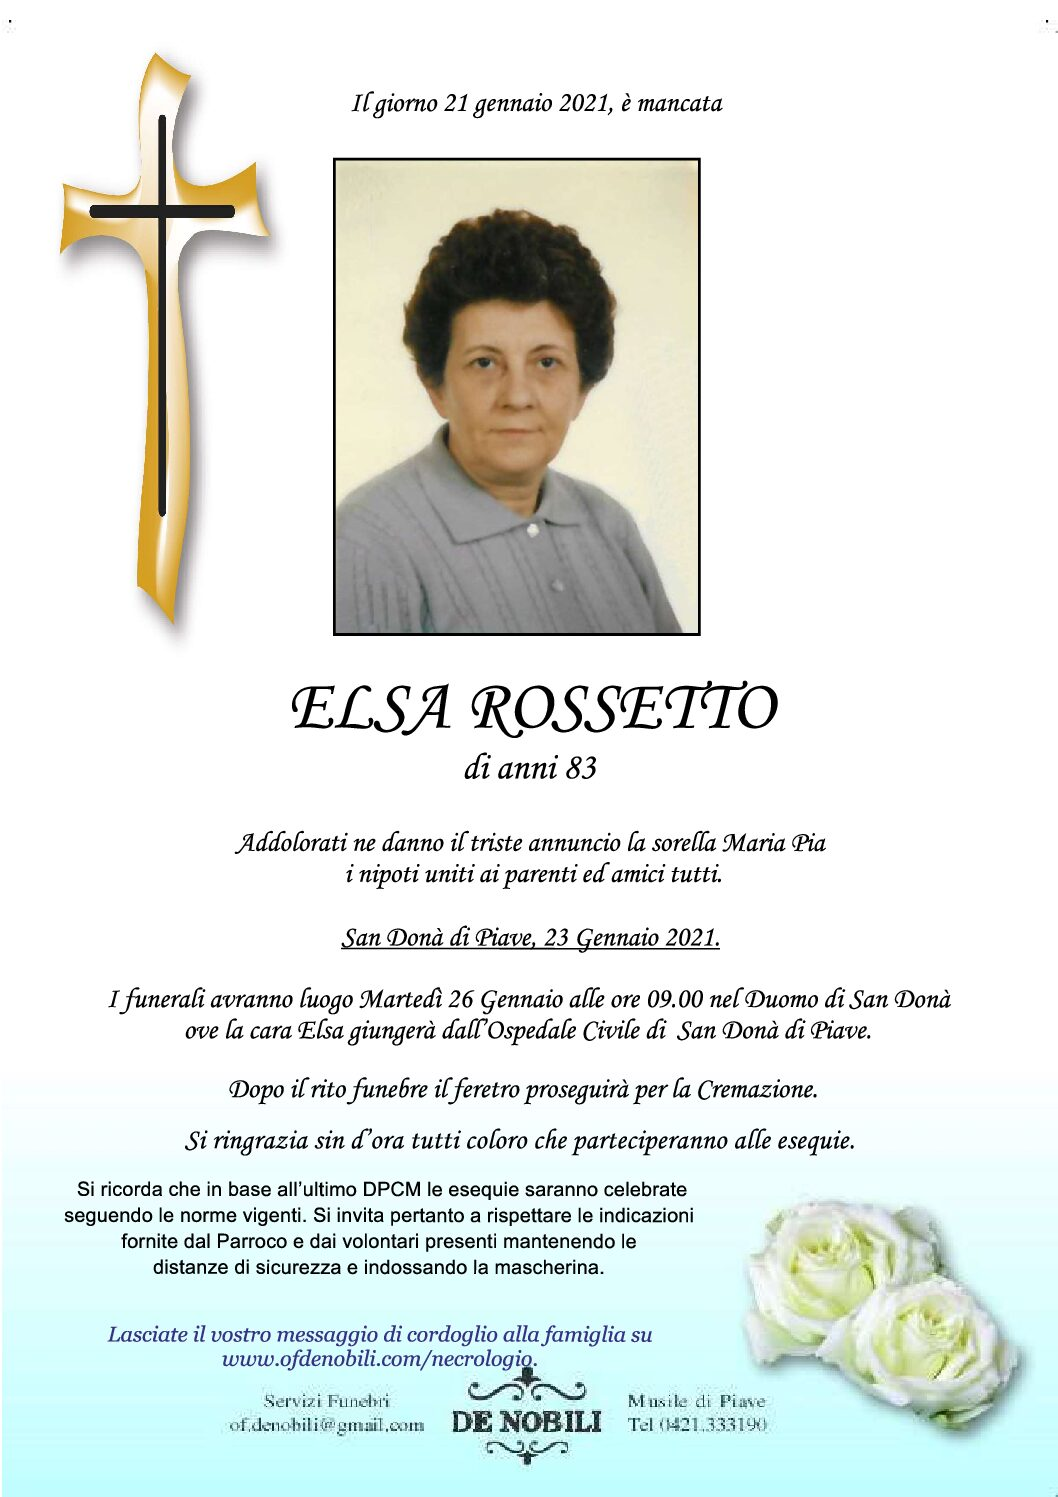 Elsa Rossetto